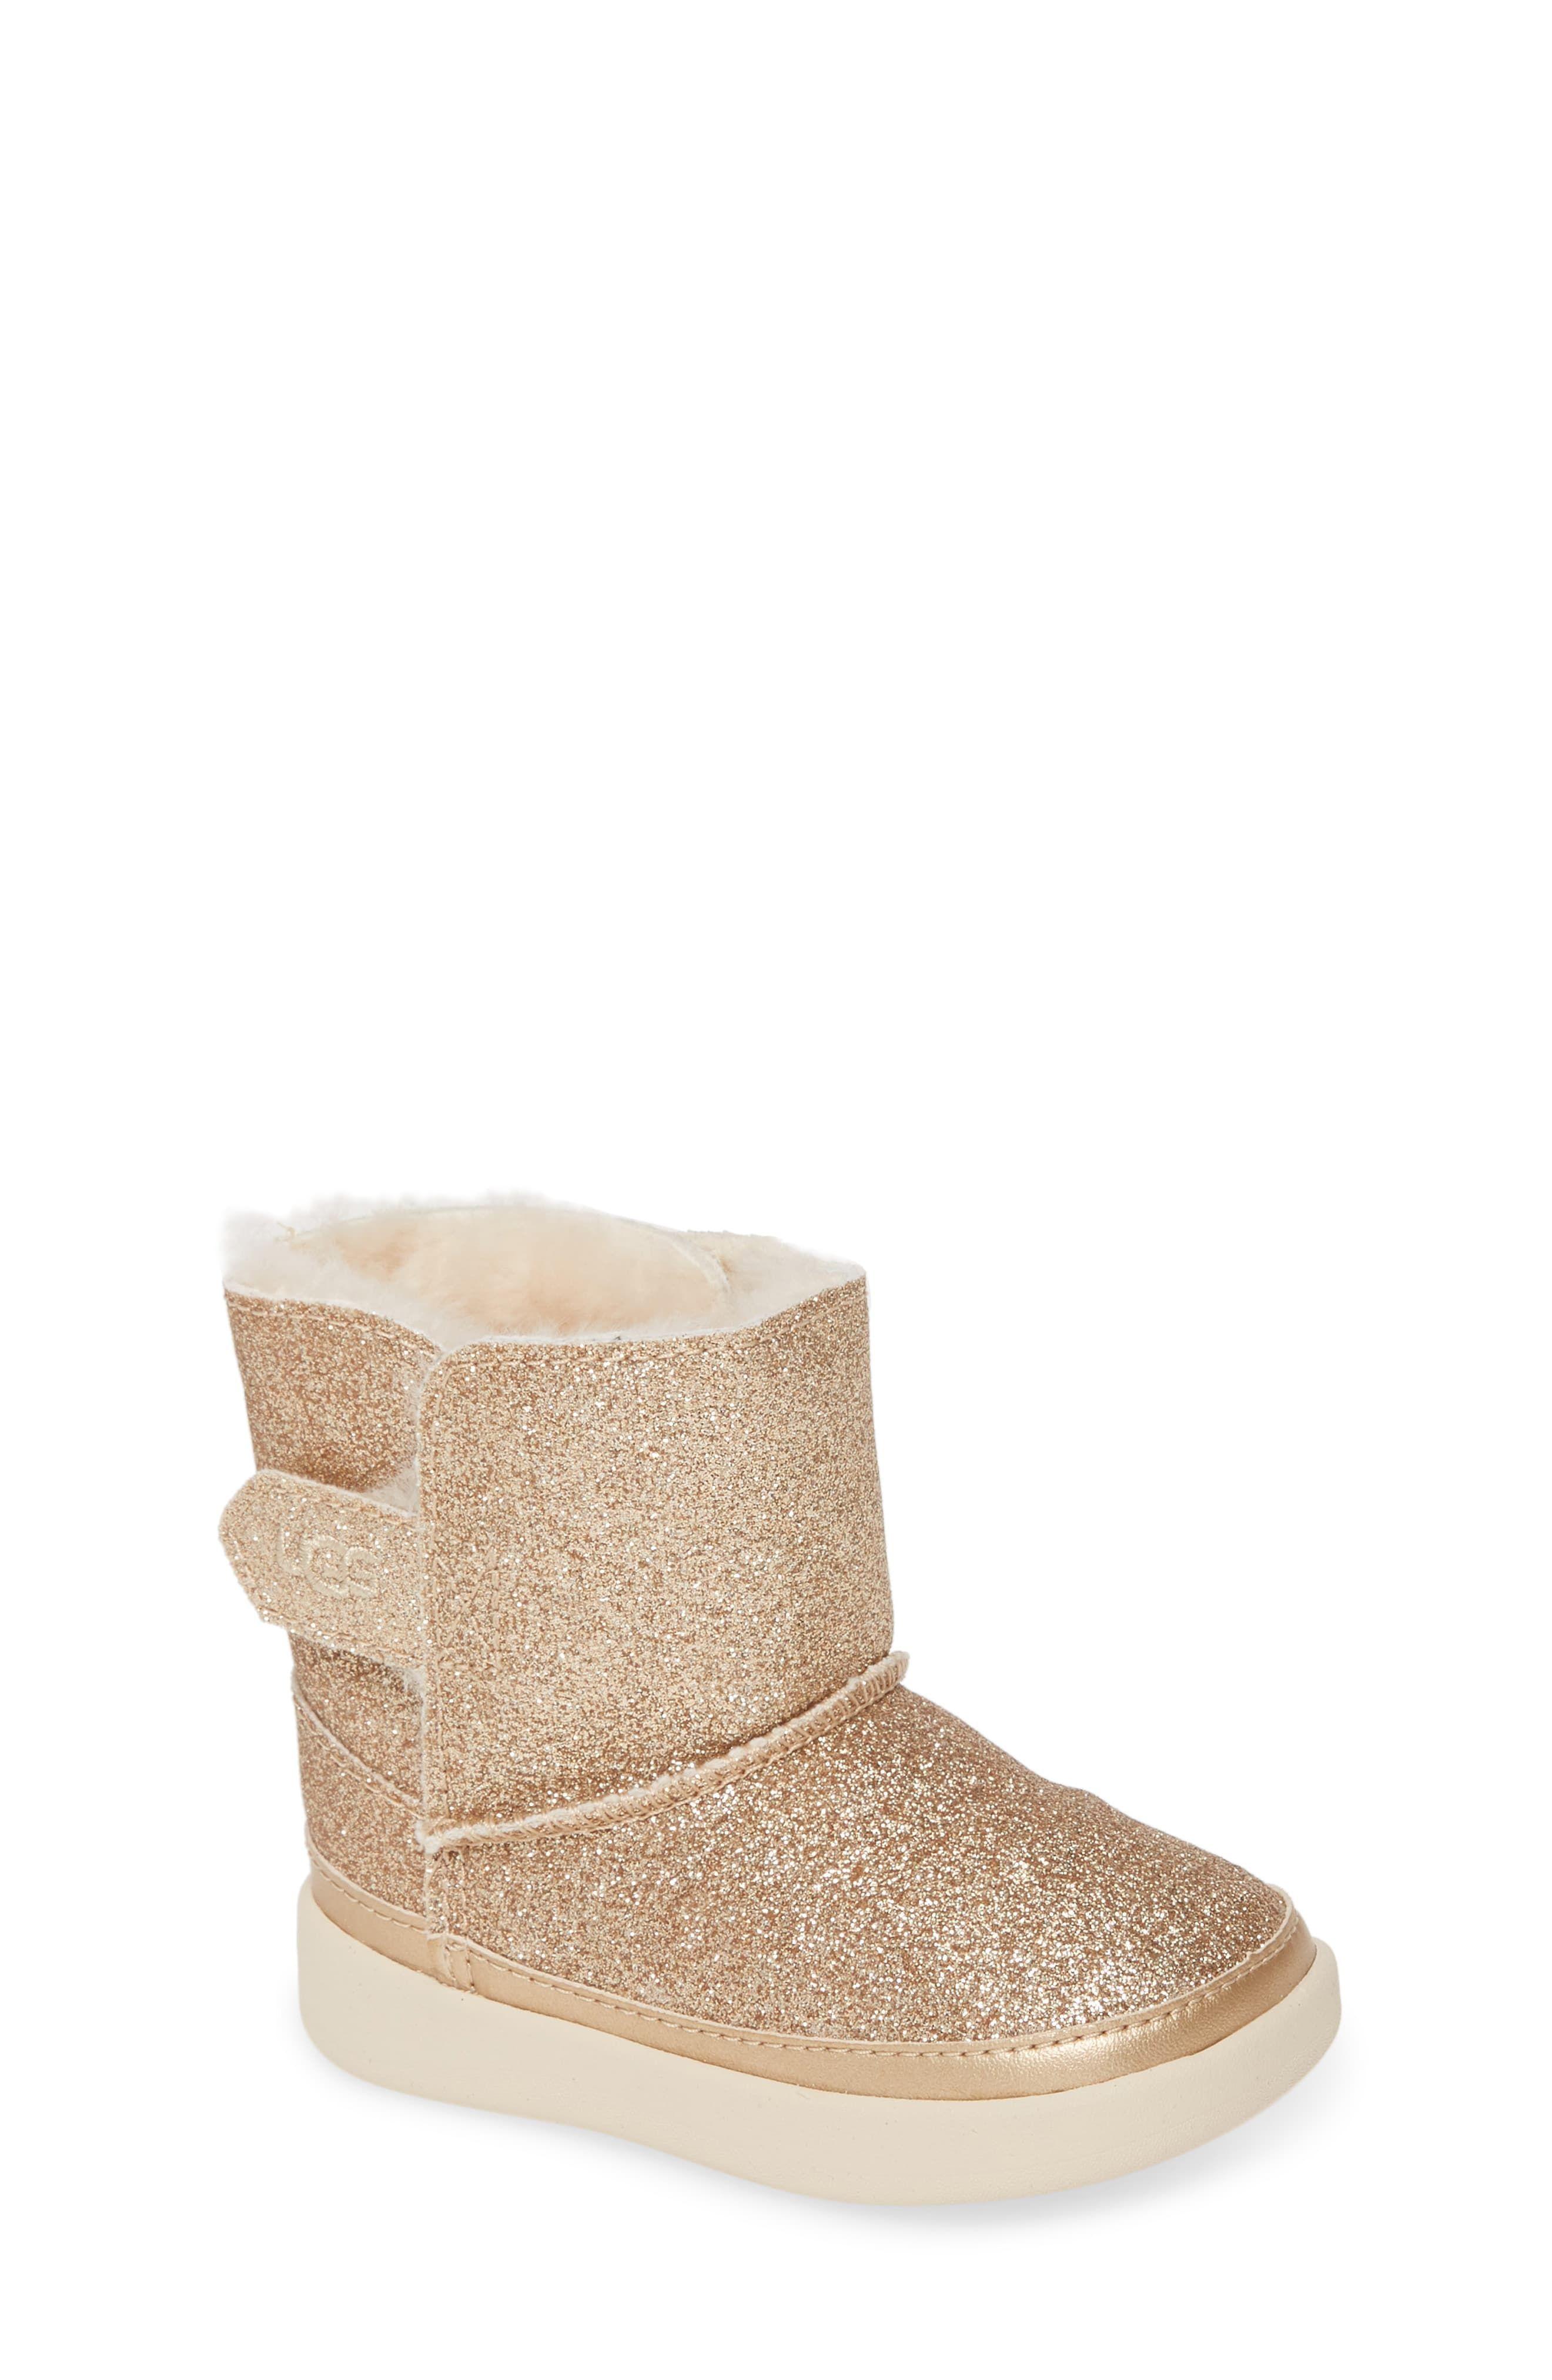 Ugg Toddler Keelan Glitter Boot Gold